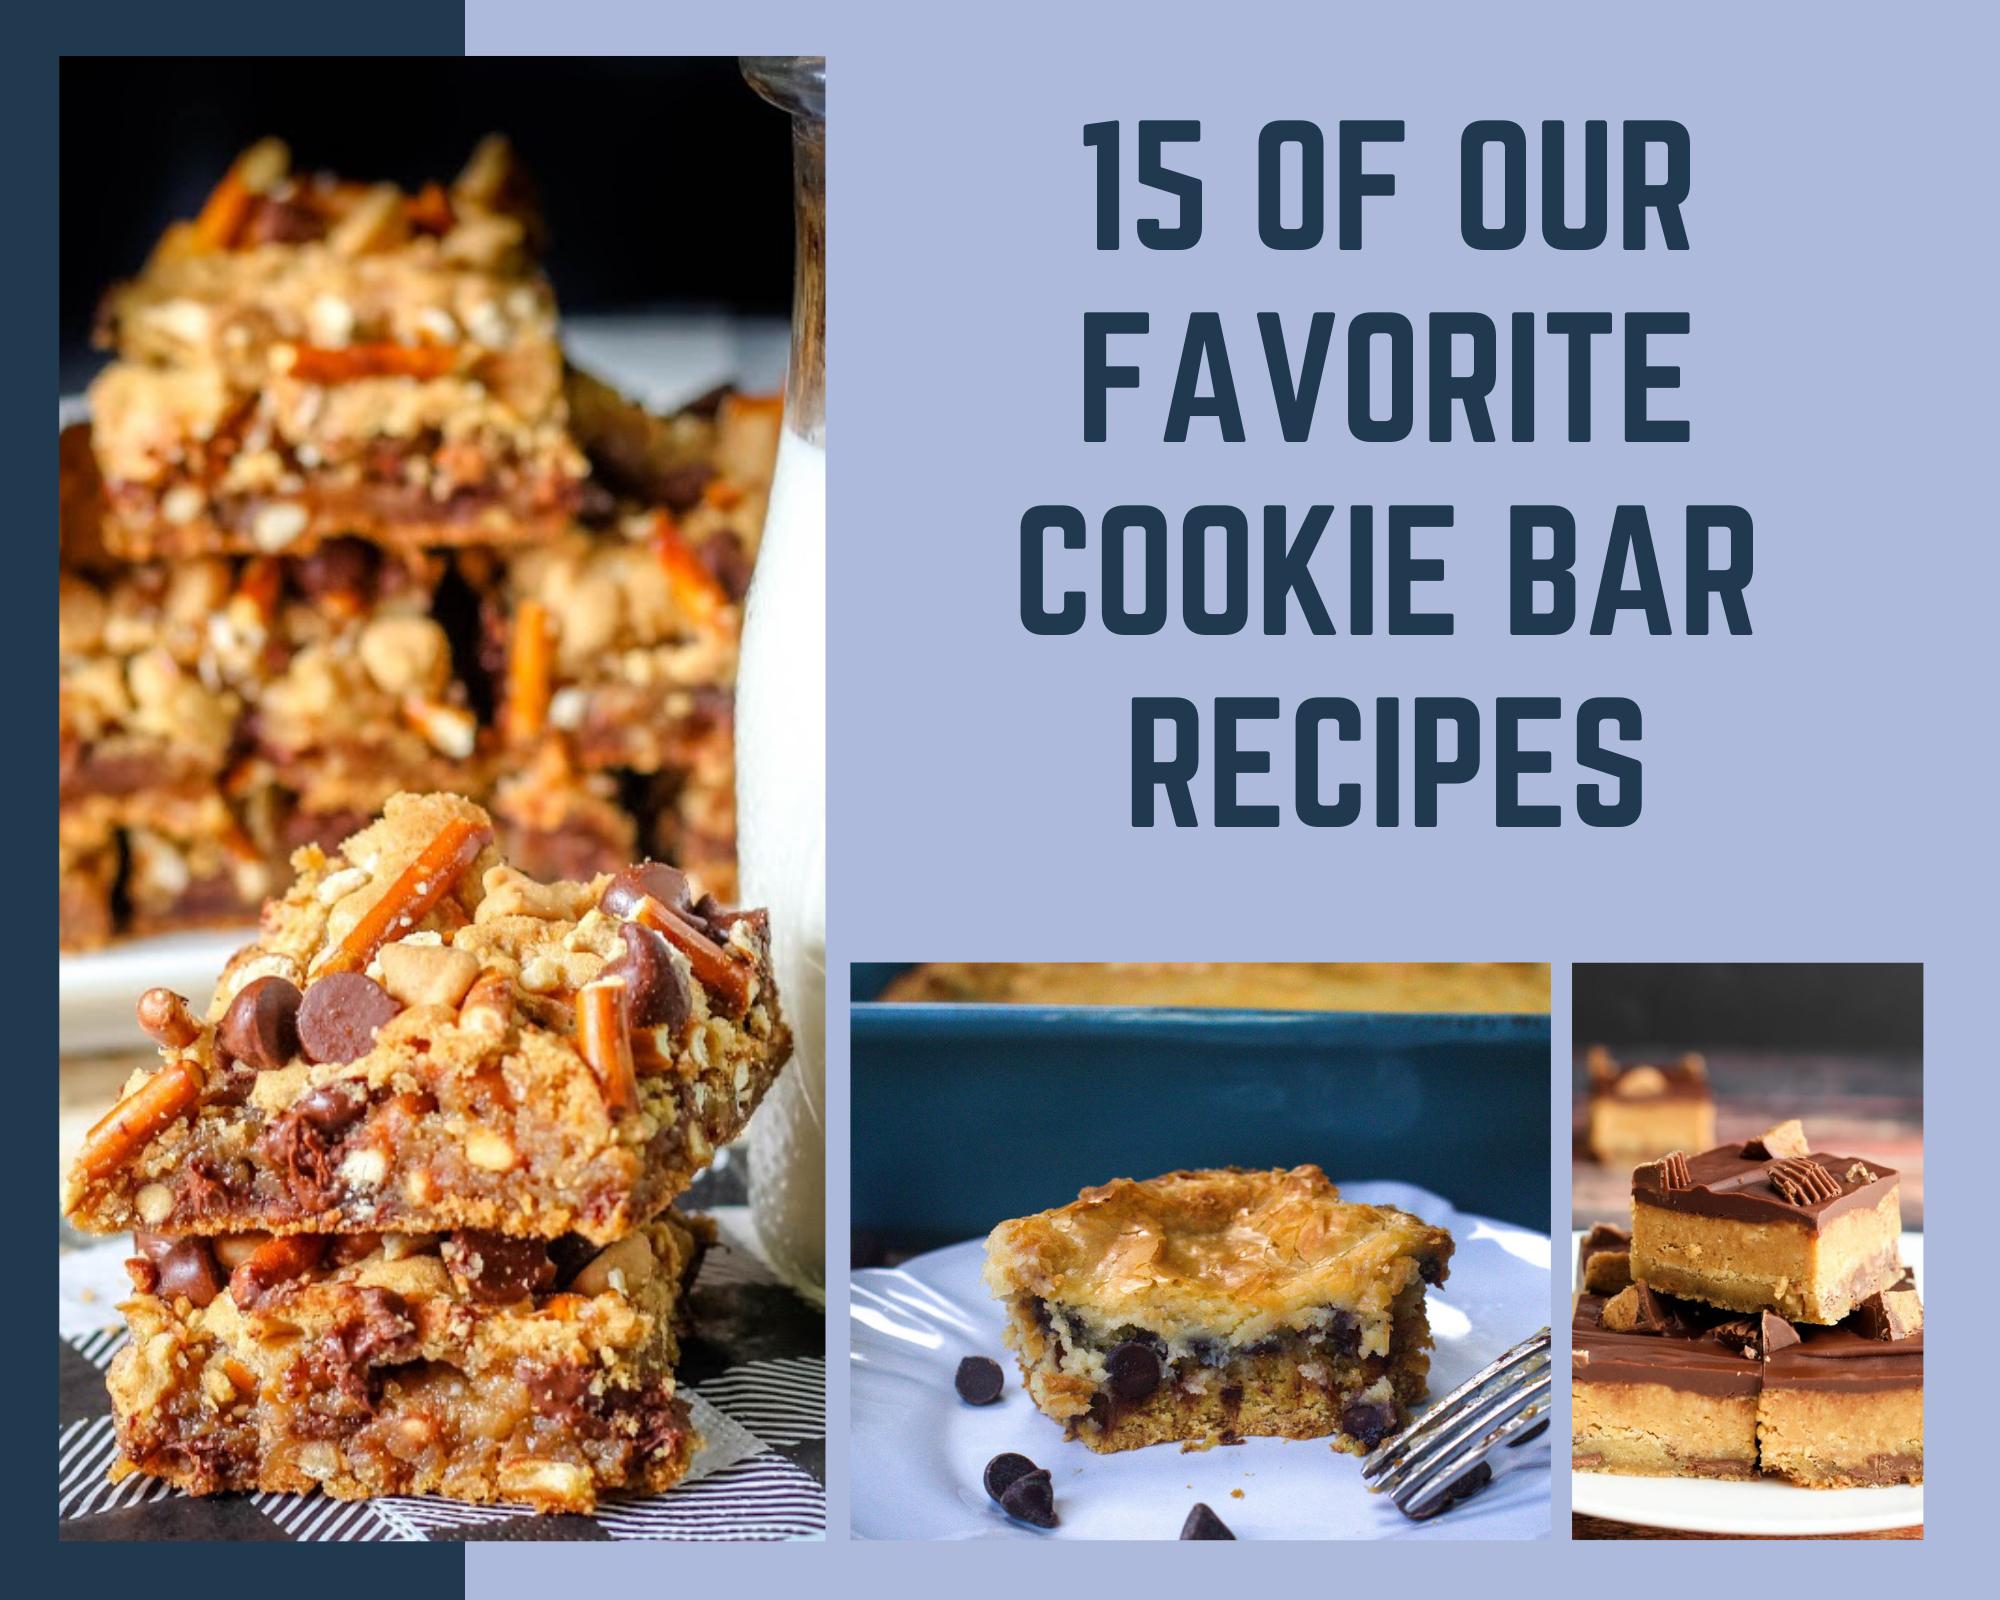 Cookie bar recipes